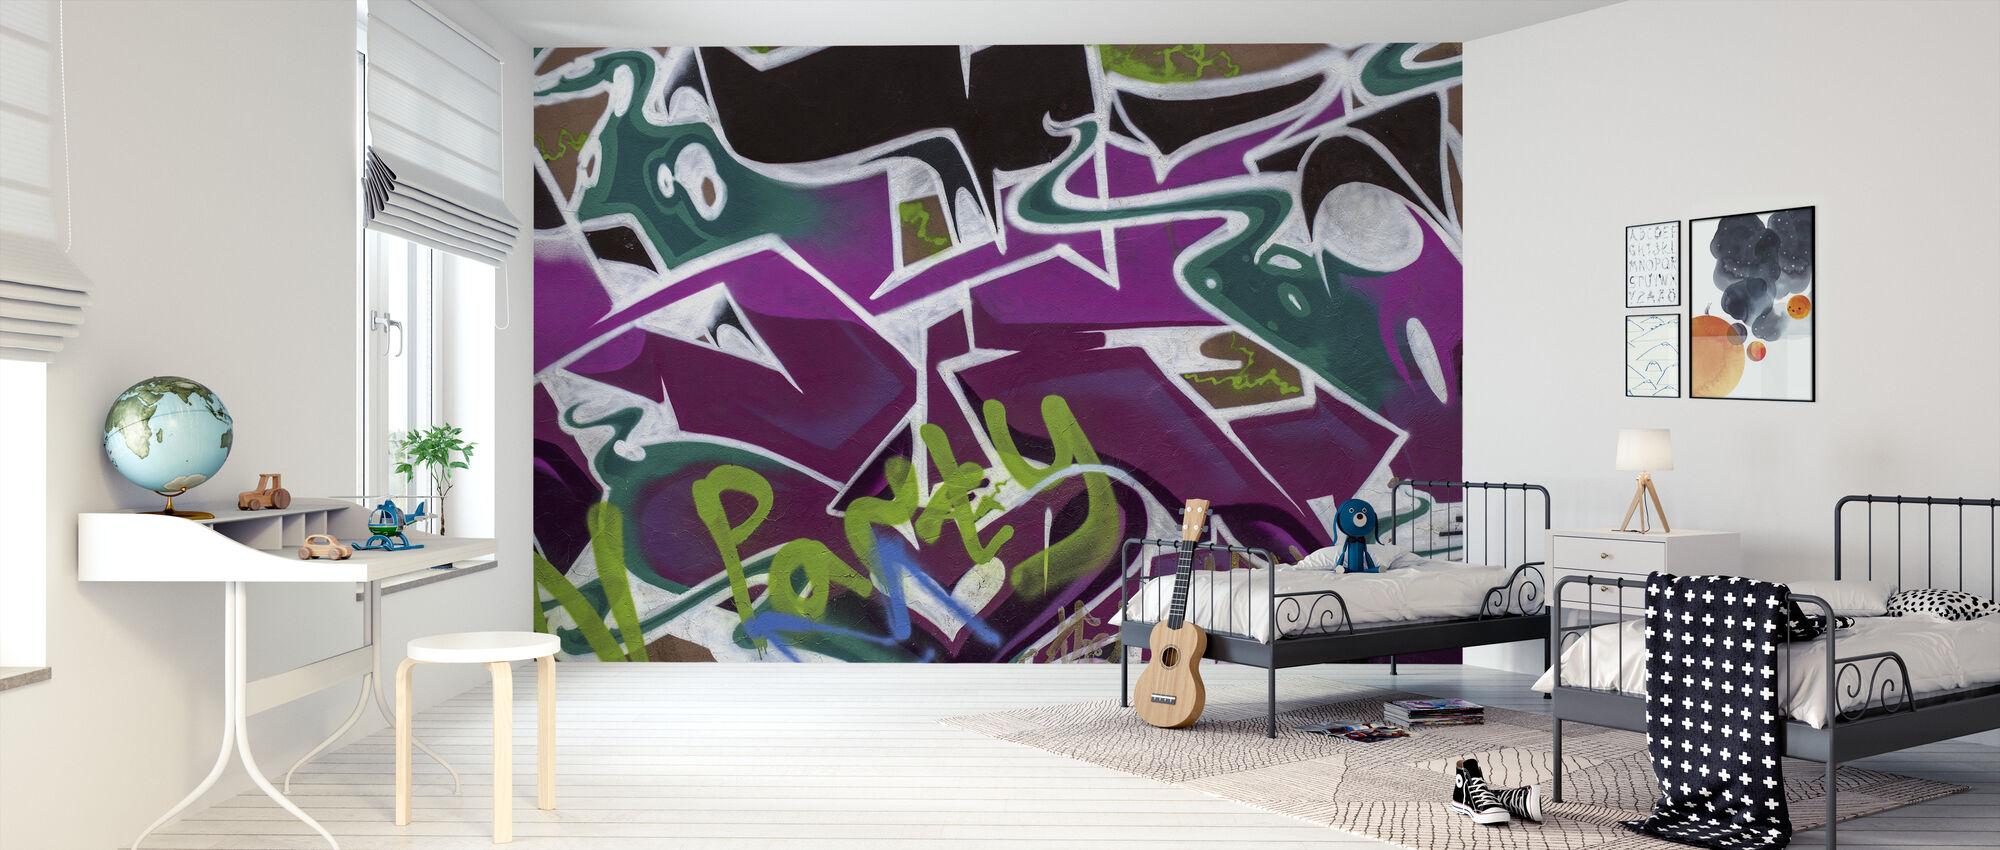 Partia graffiti - Tapeta - Pokój dziecięcy